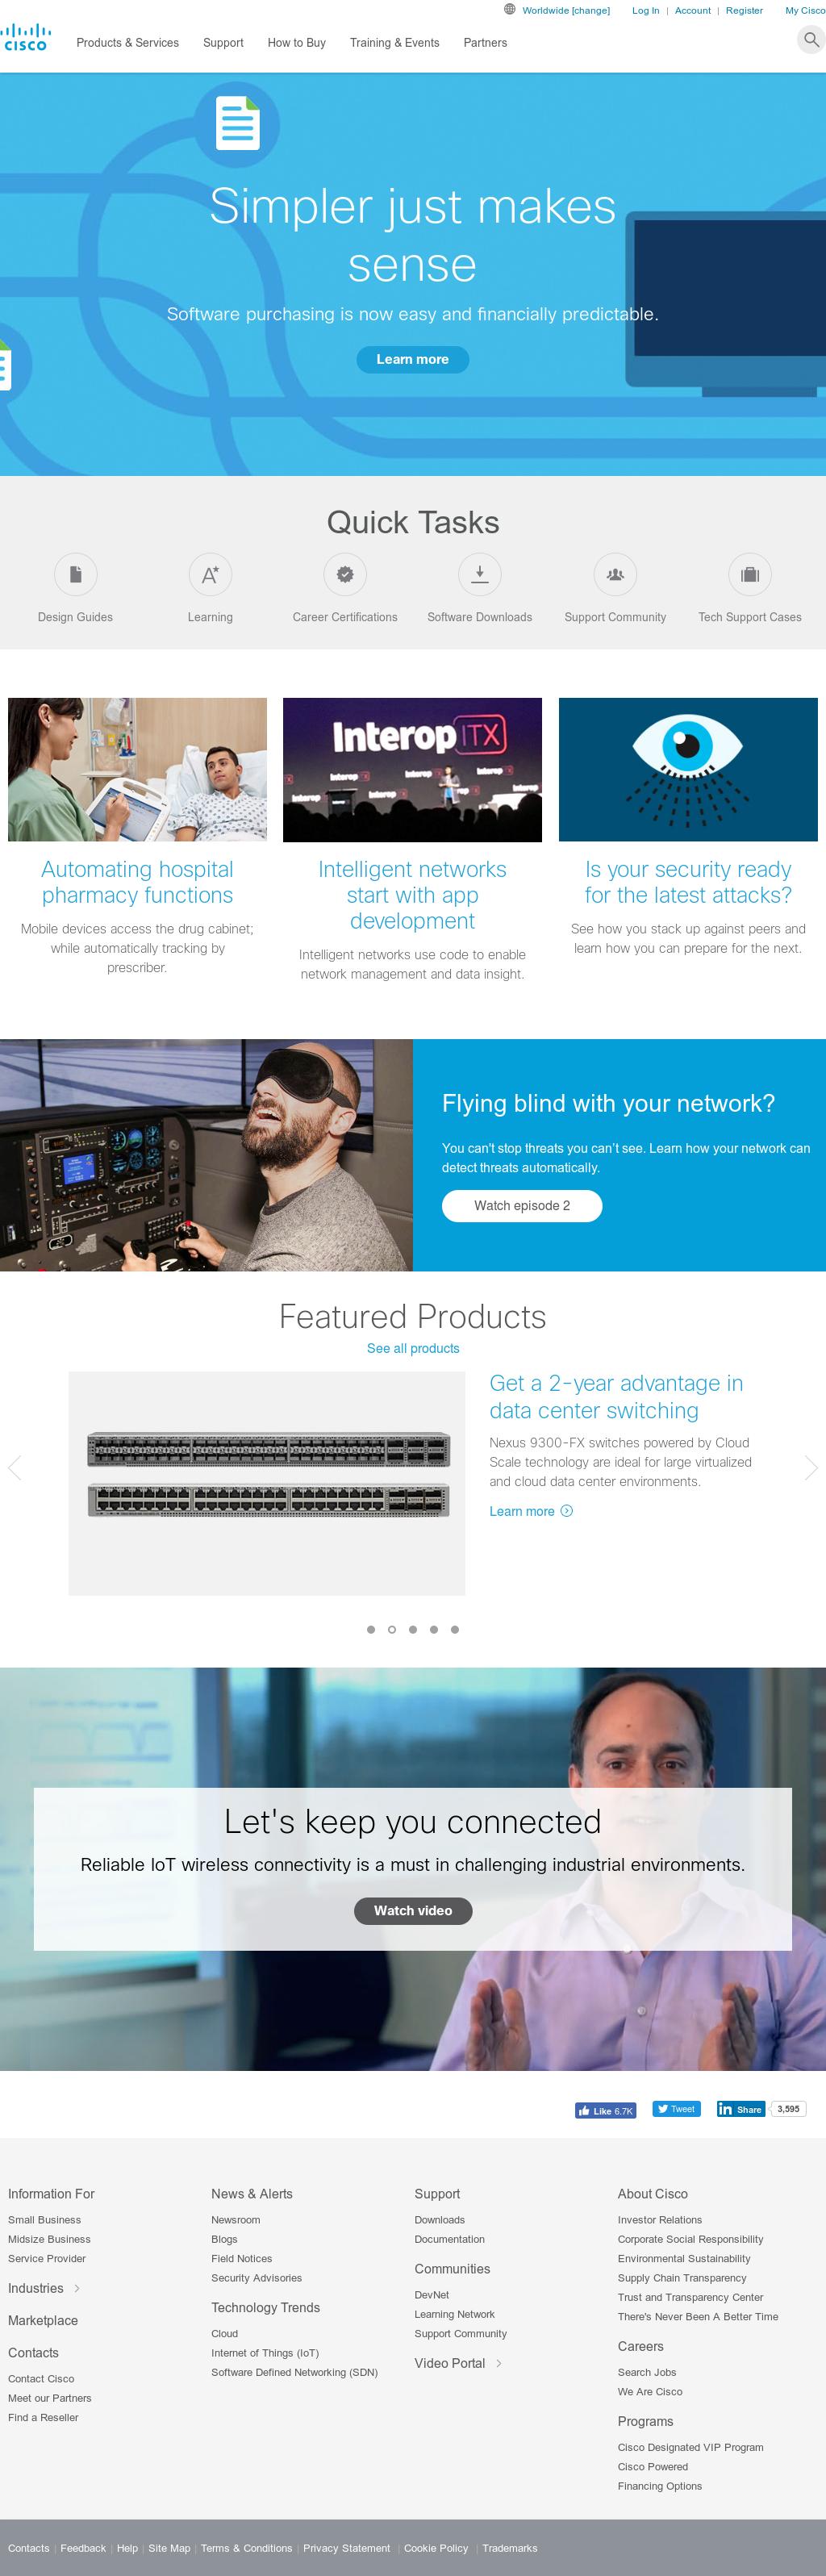 Cisco Competitors, Revenue and Employees - Owler Company Profile